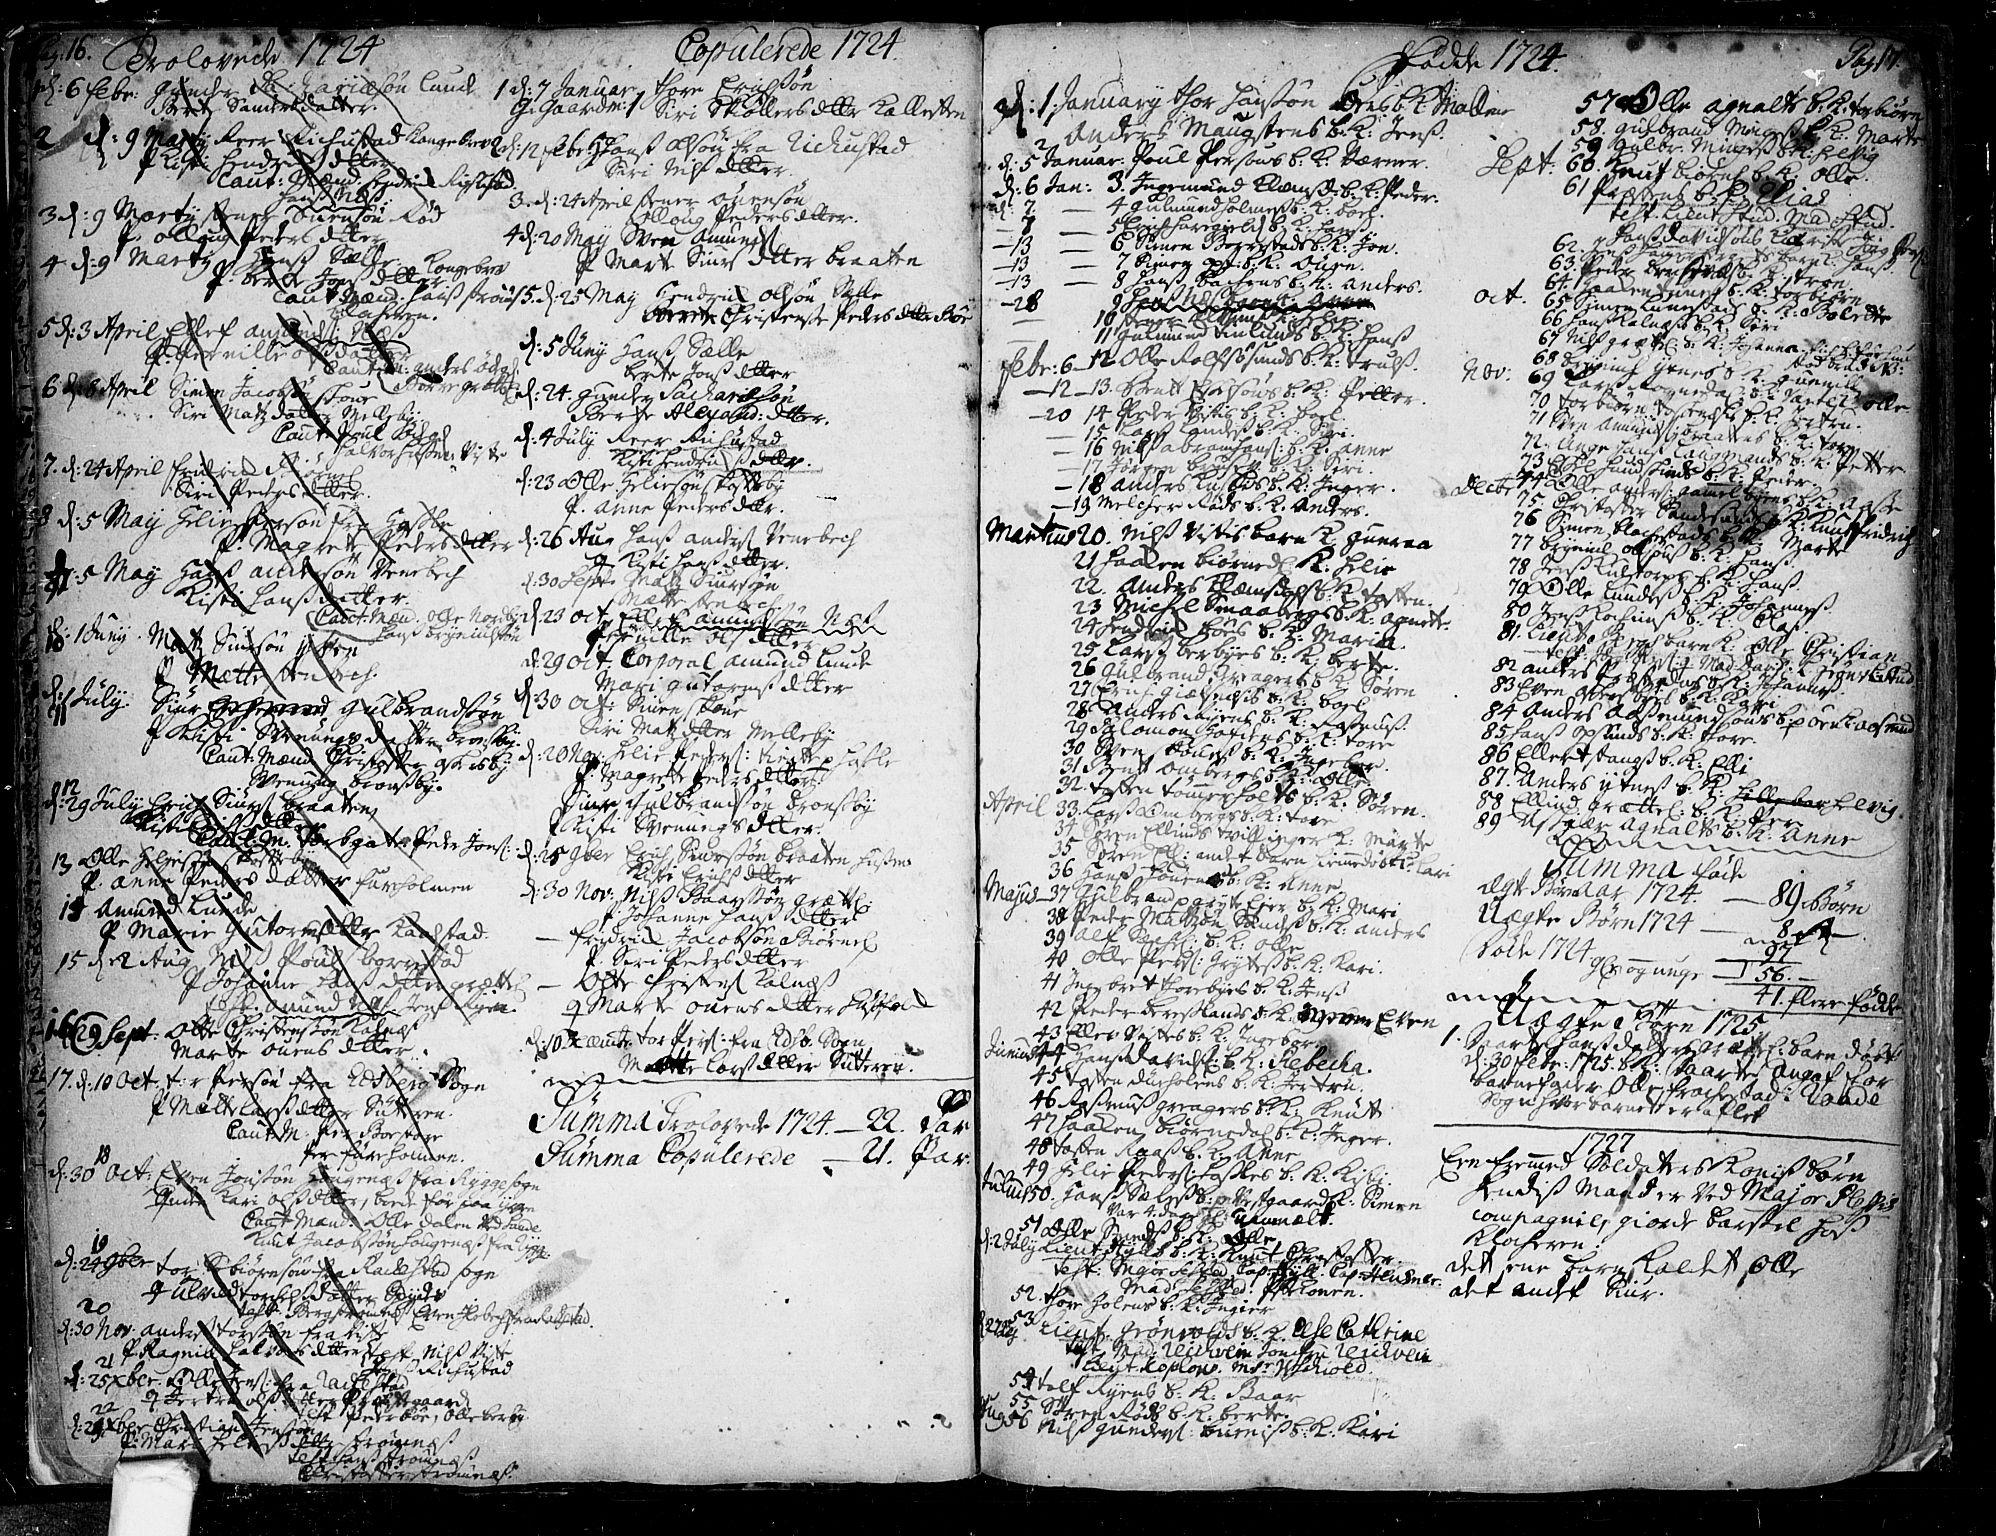 SAO, Tune prestekontor Kirkebøker, F/Fa/L0001: Parish register (official) no. 1, 1720-1758, p. 16-17